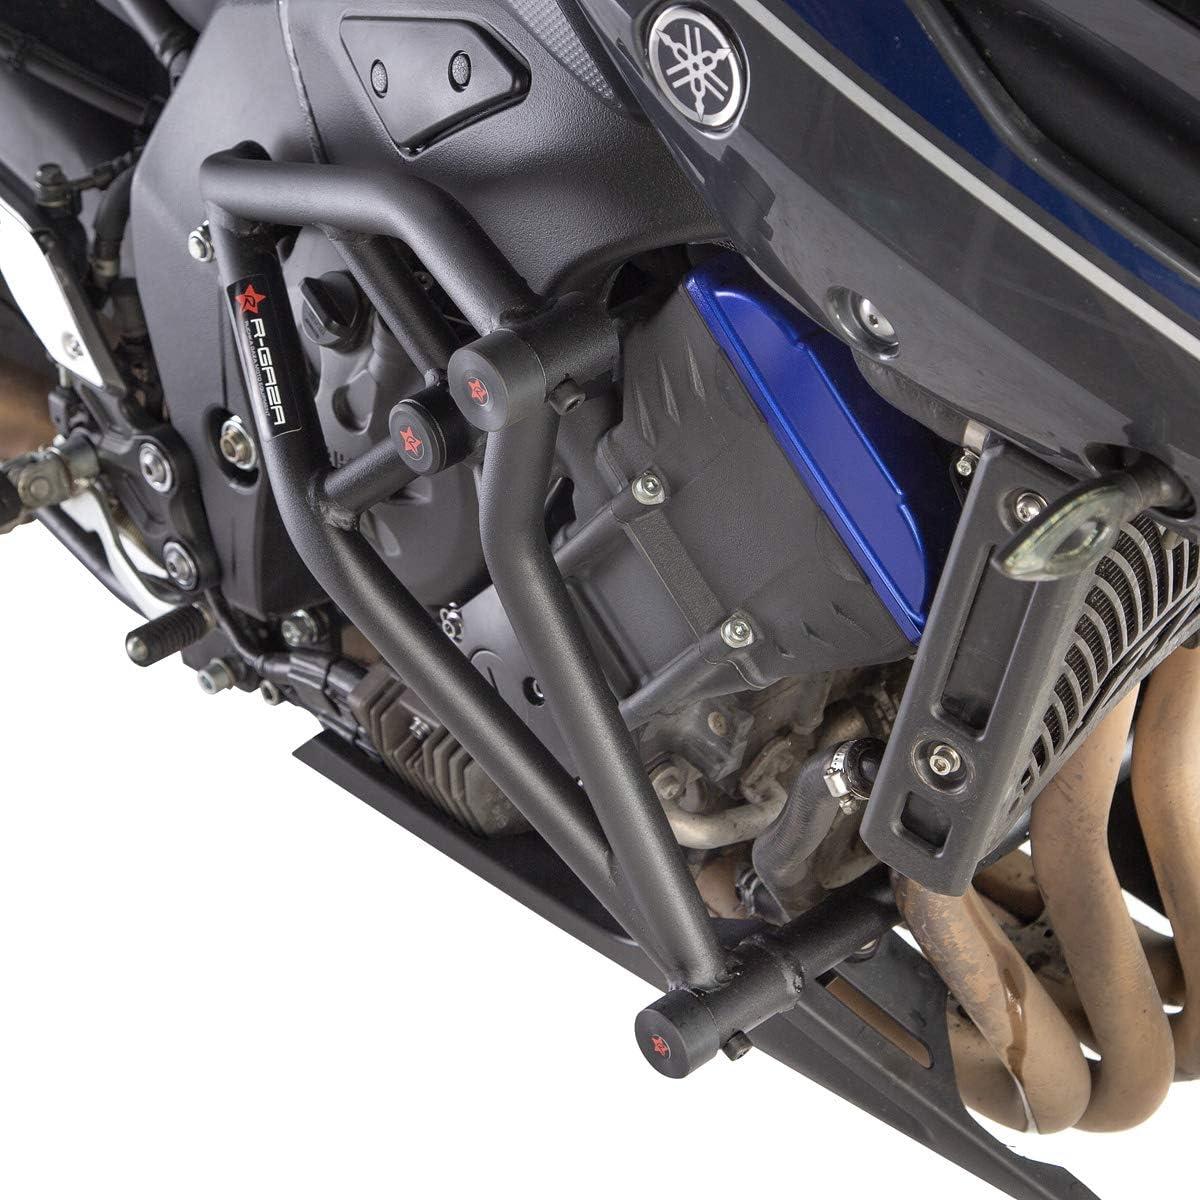 Yamaha FZ8 FAZER8 2010-2015 R-Gaza Street Cage Crash Bars with Sliders